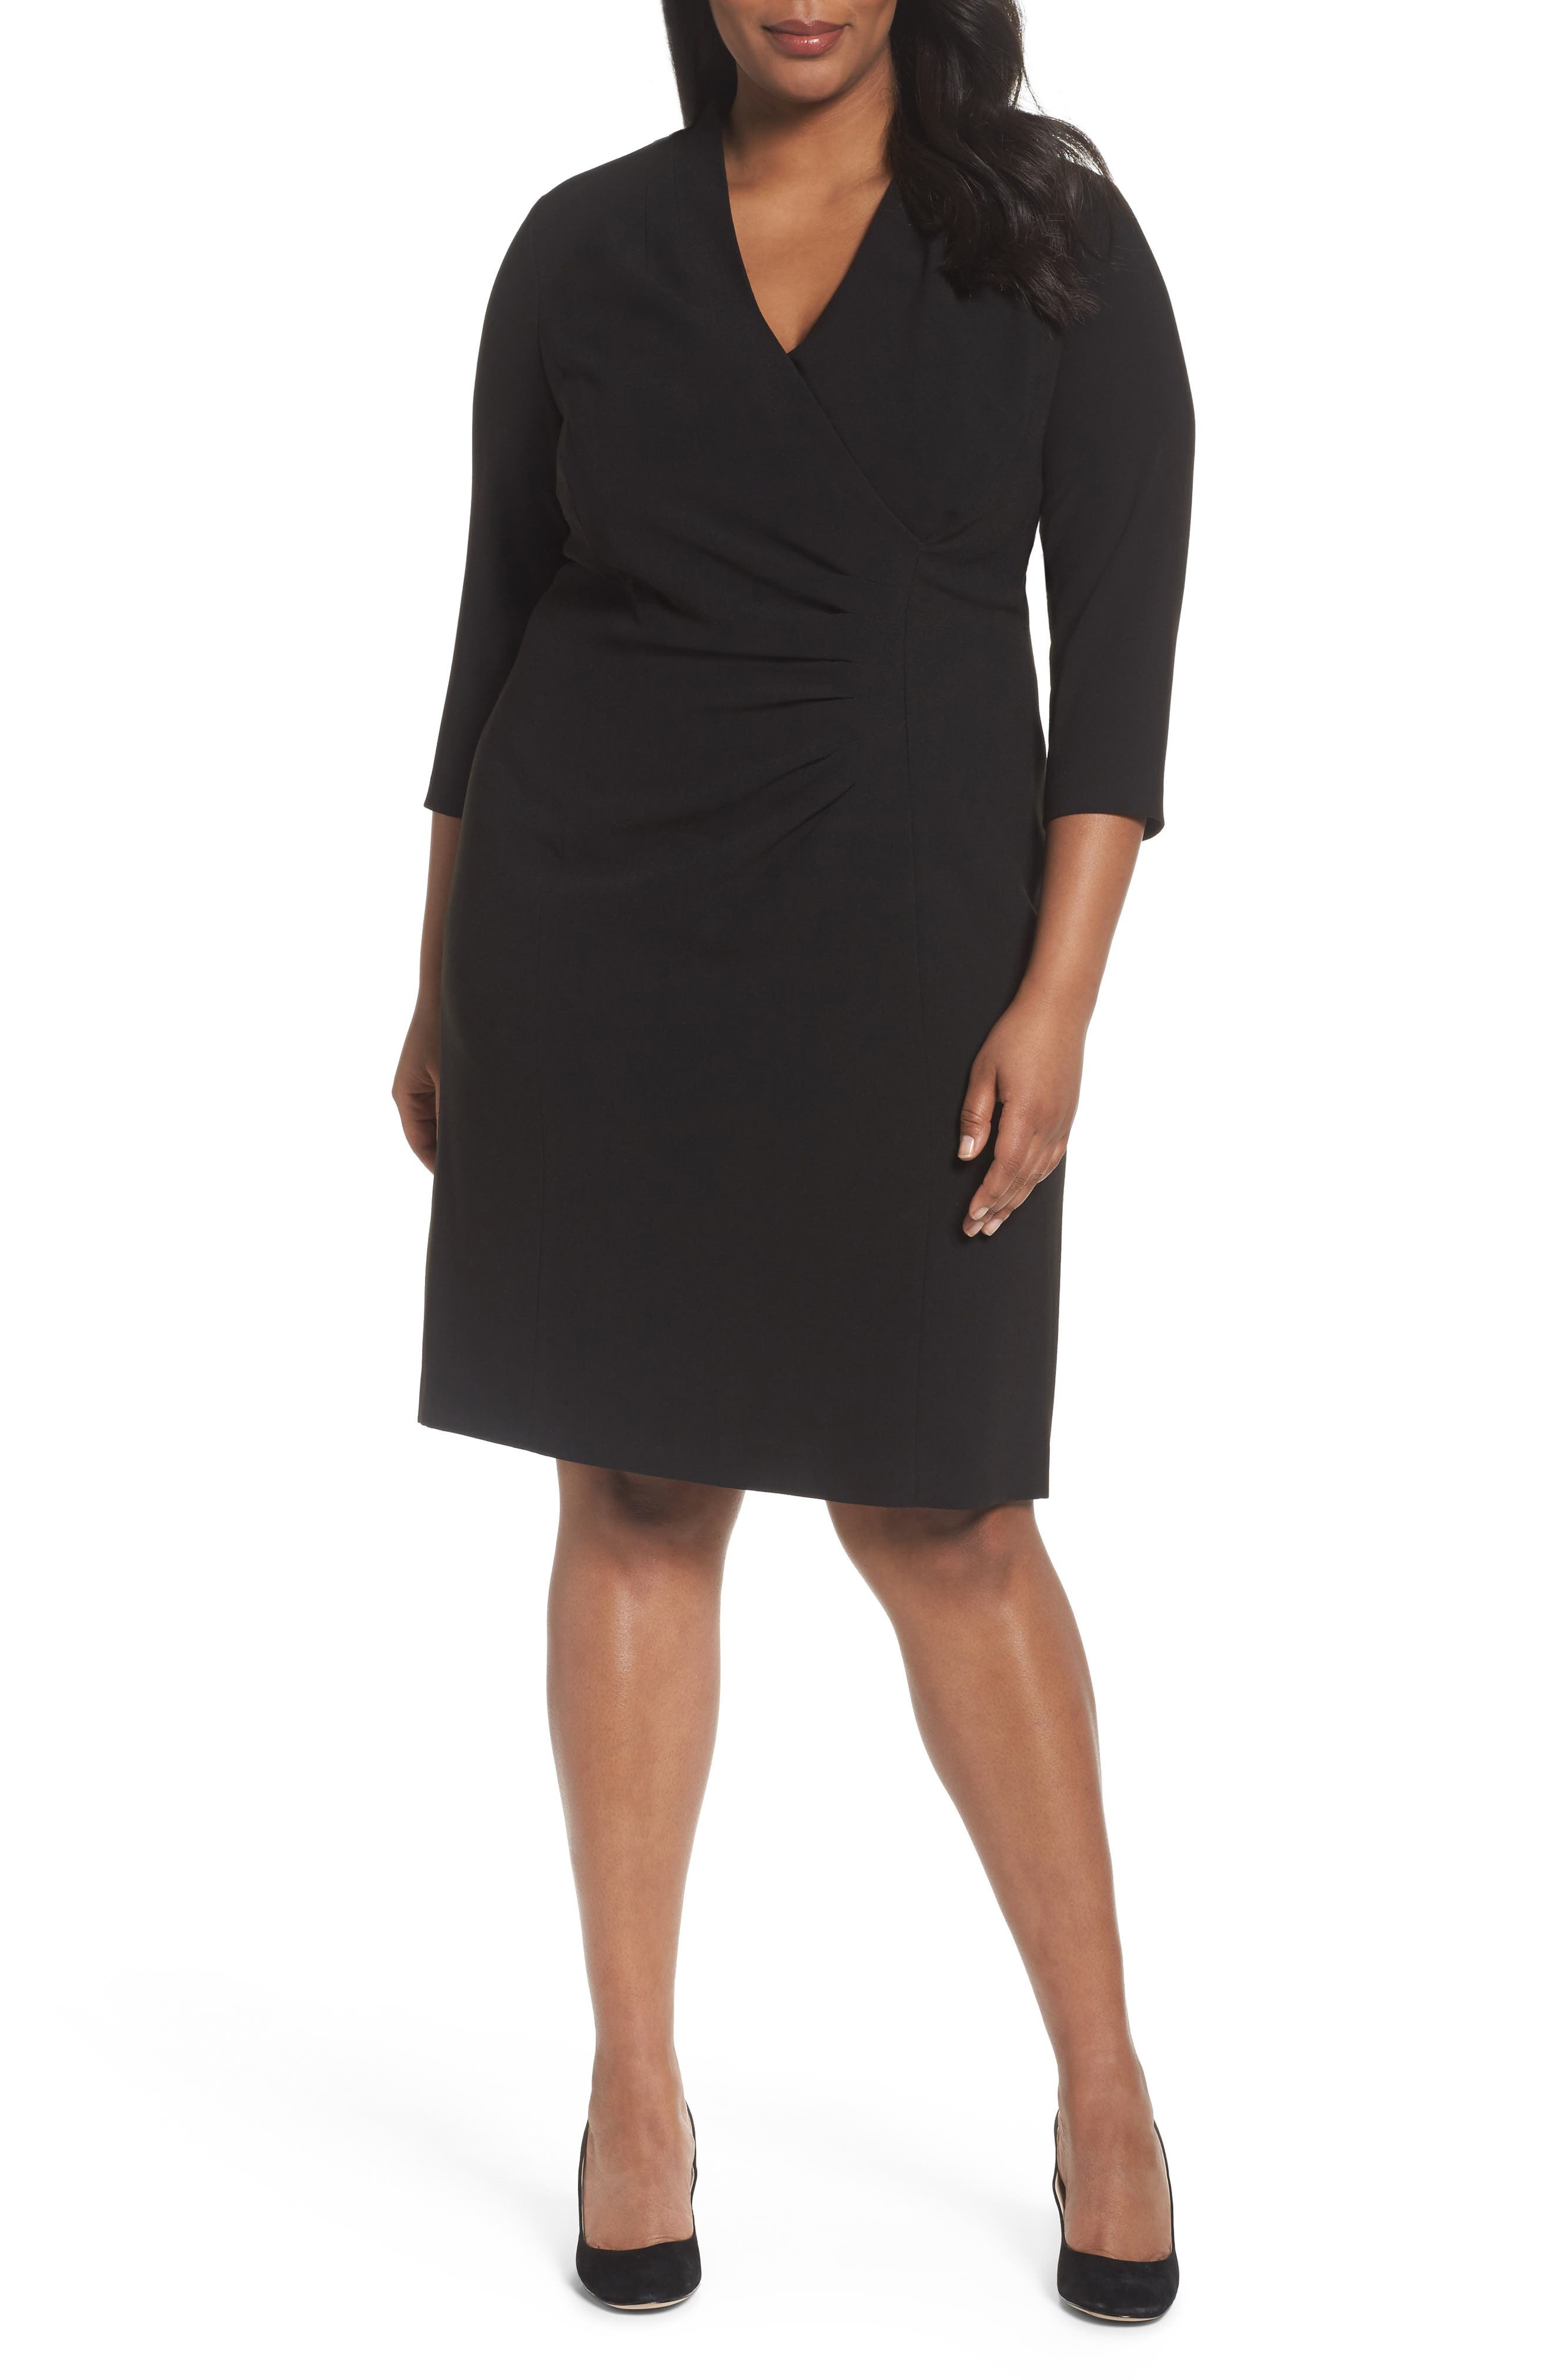 Tahari Side Pleat Crepe Sheath Dress (Plus Size)